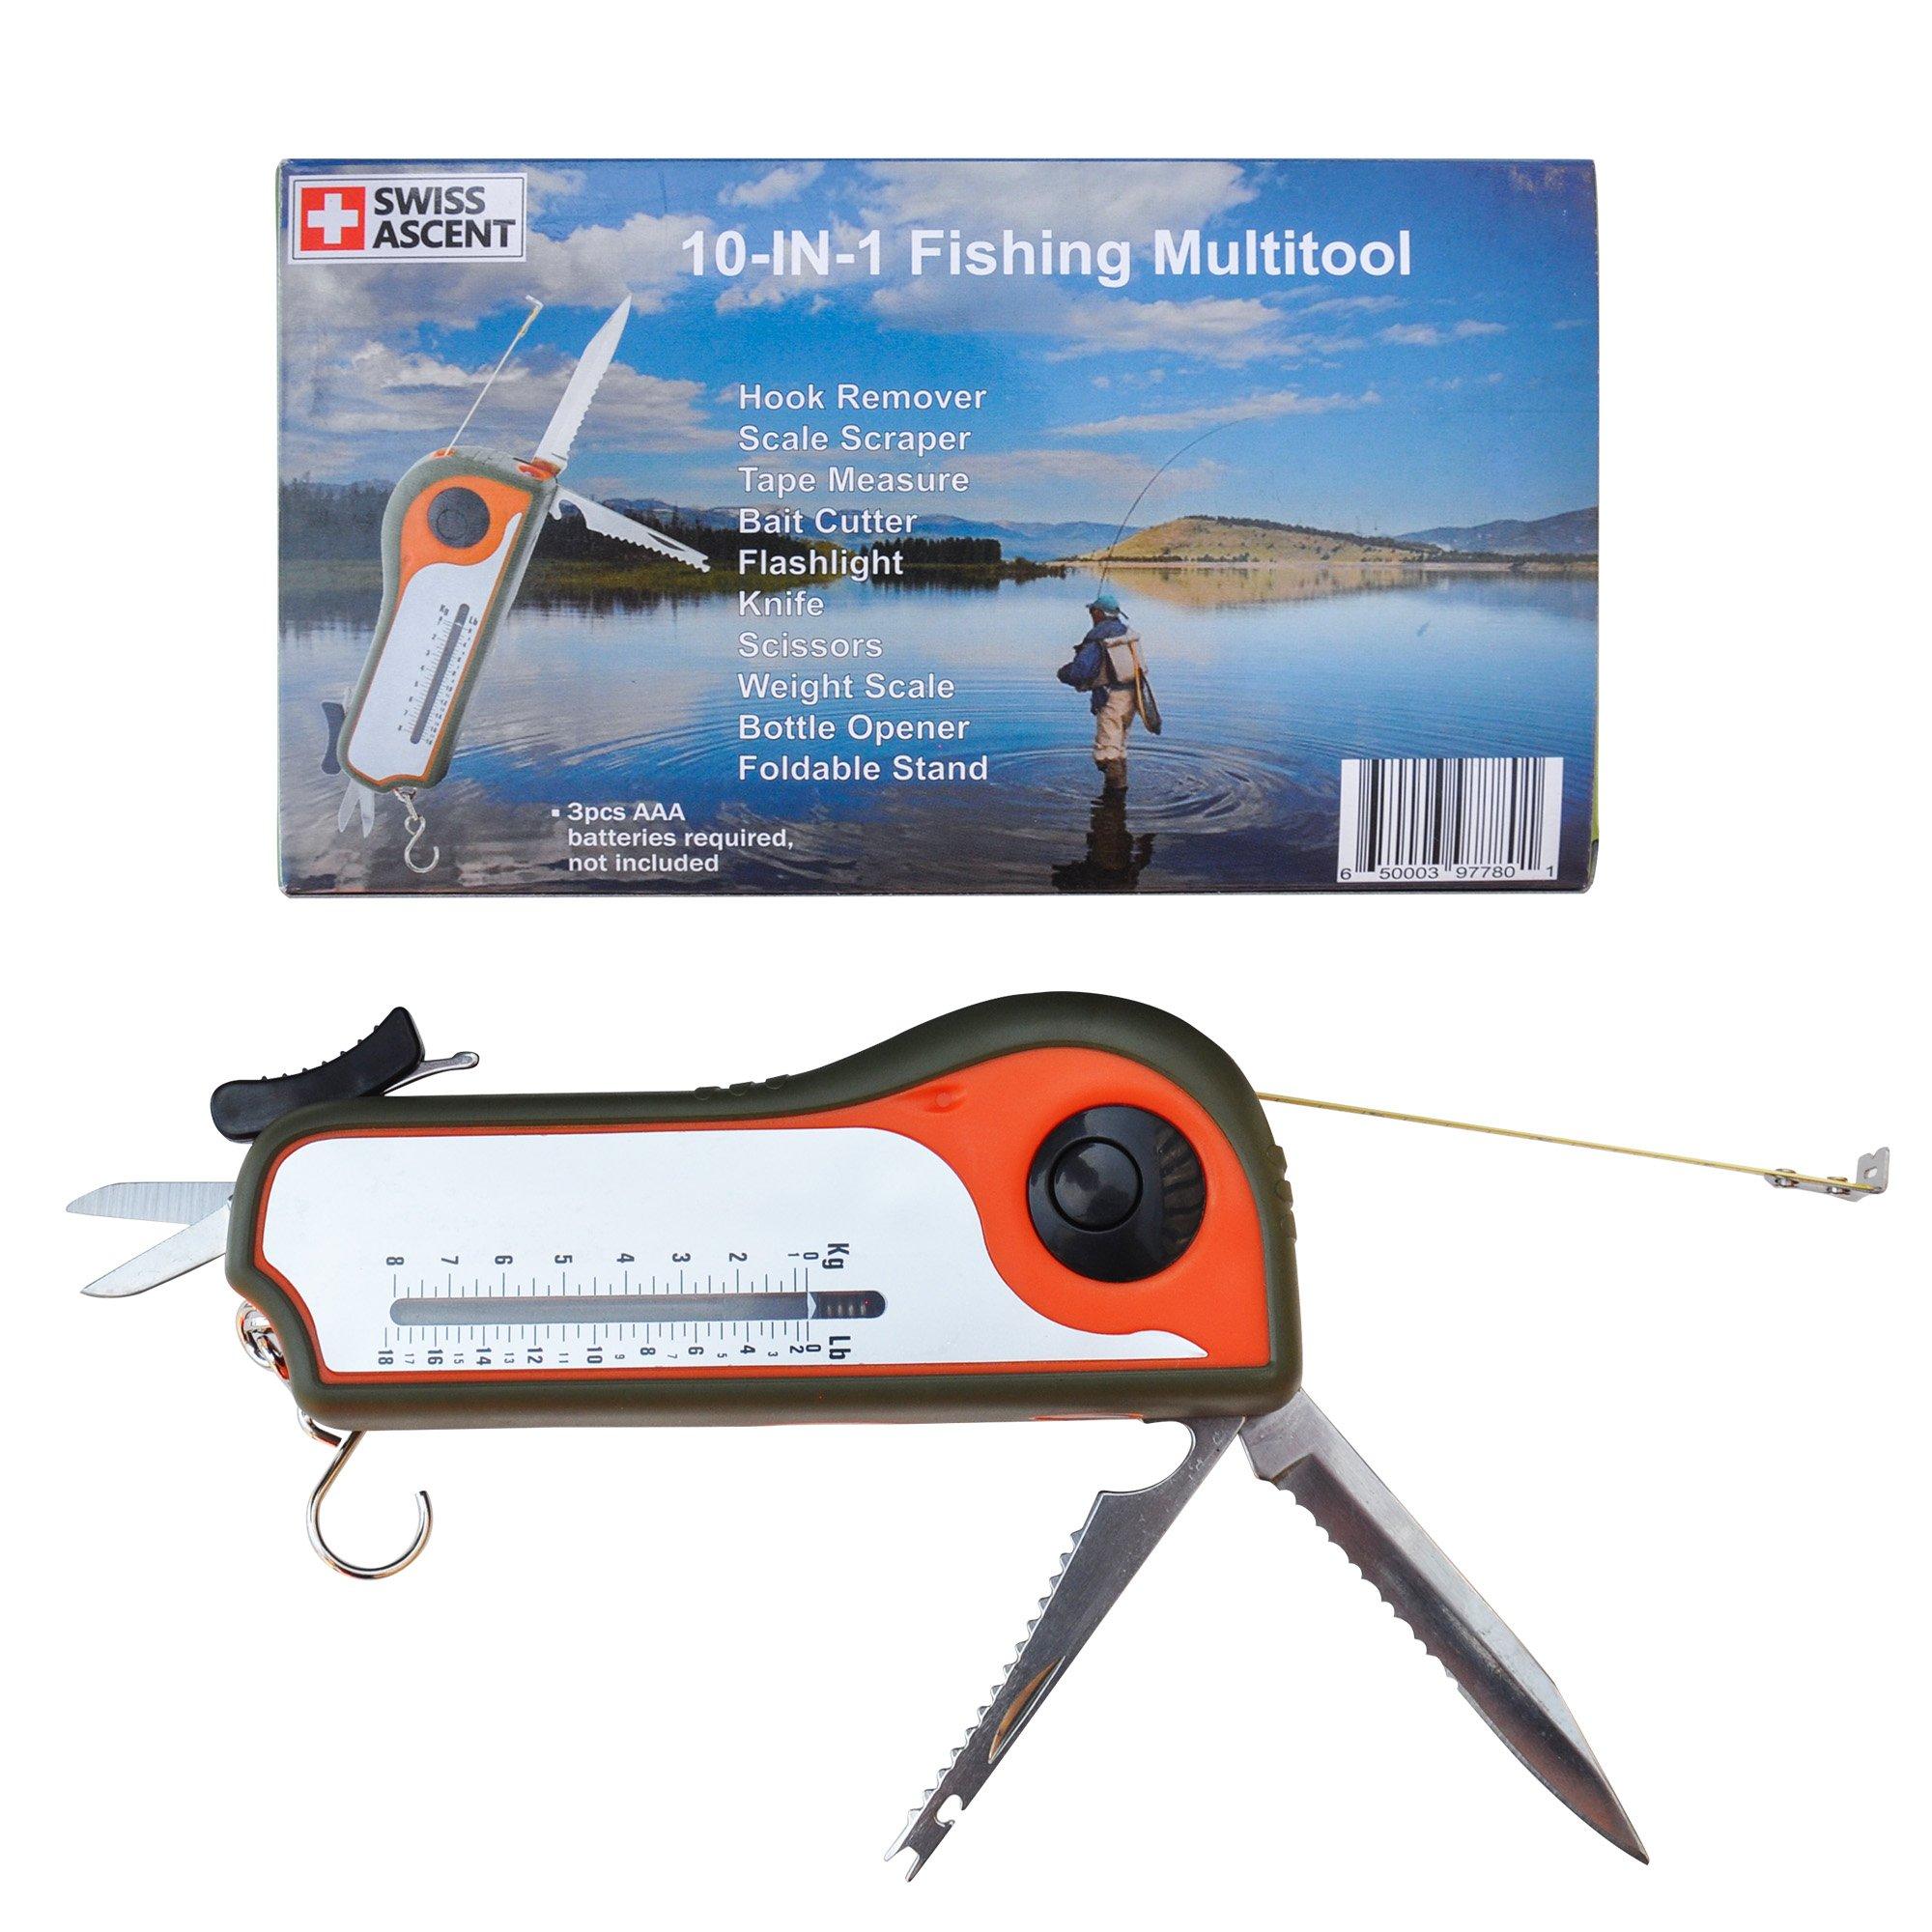 Fisherman Gift Tool Fishing Multitool - Hook Remover, Scale Scraper, Tape Measure, Bait Cutter, Flashlight, Knife, Scissors, Weight Scale, Bottle Opener, Gift Idea For Men Women Kids